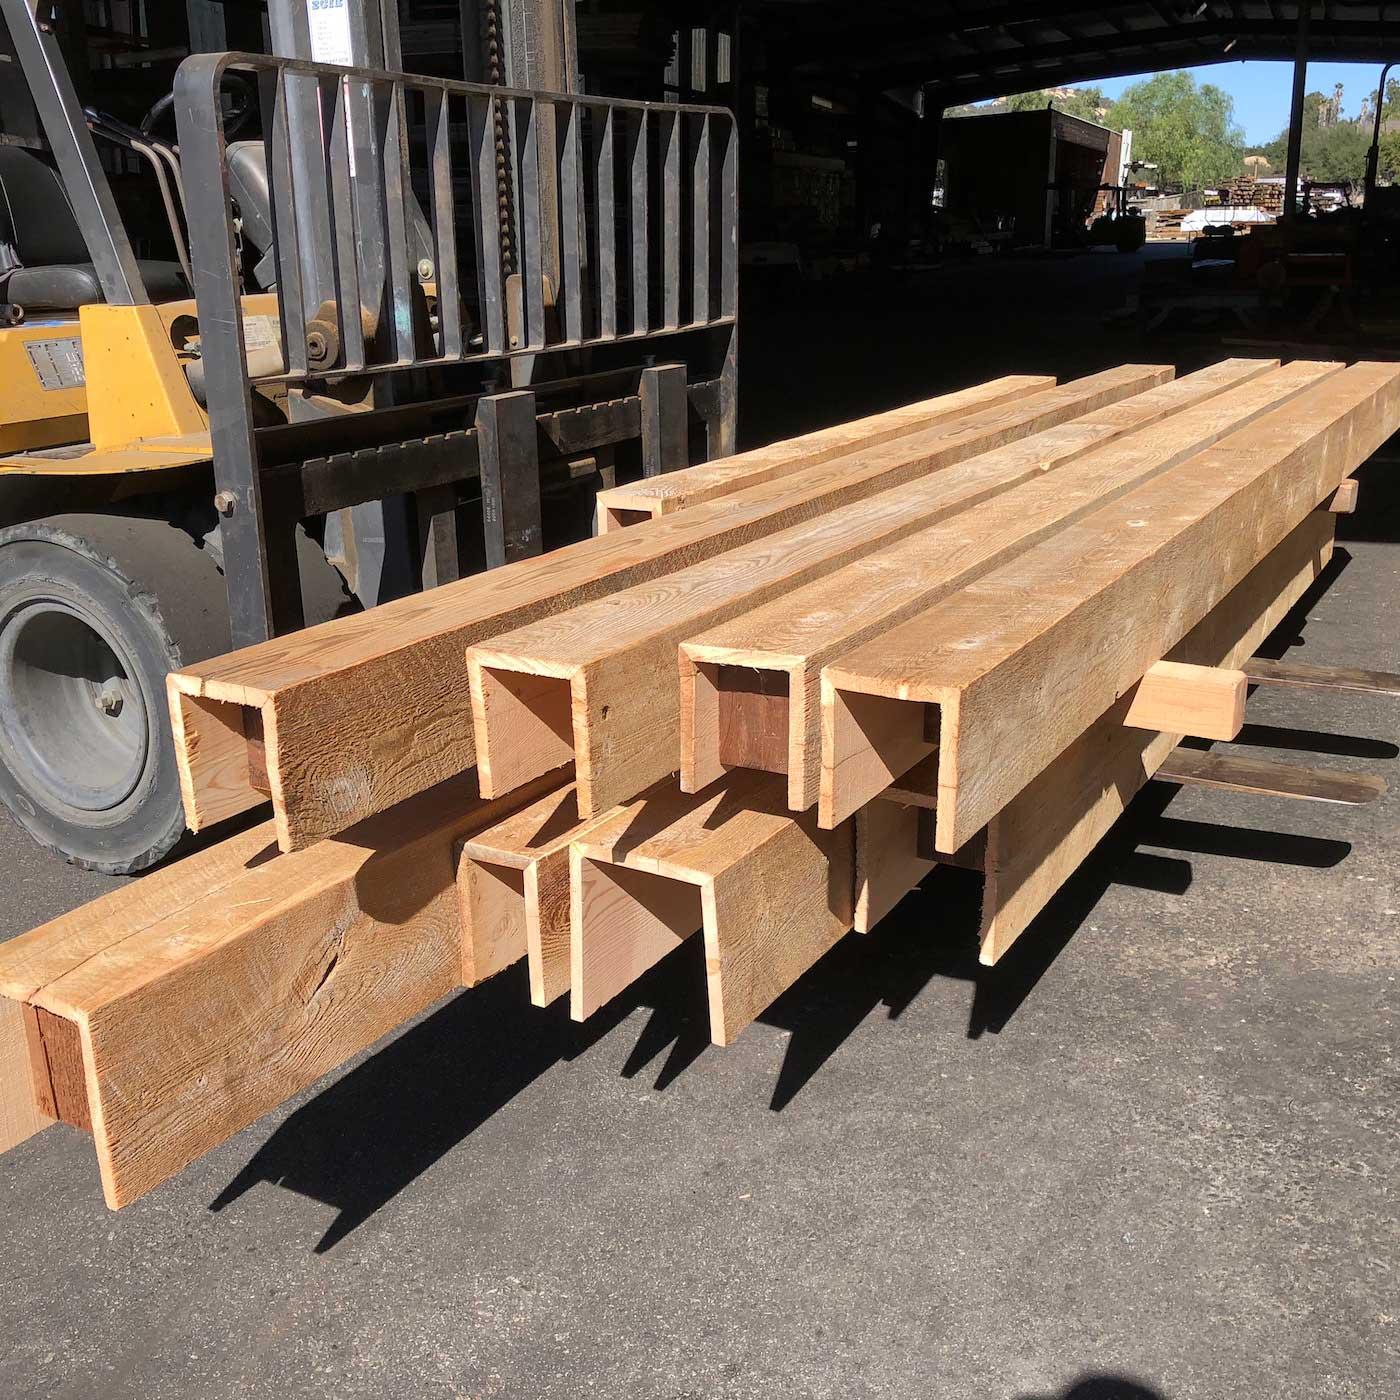 Driftwood Box Beams - Box Beam Fabrication